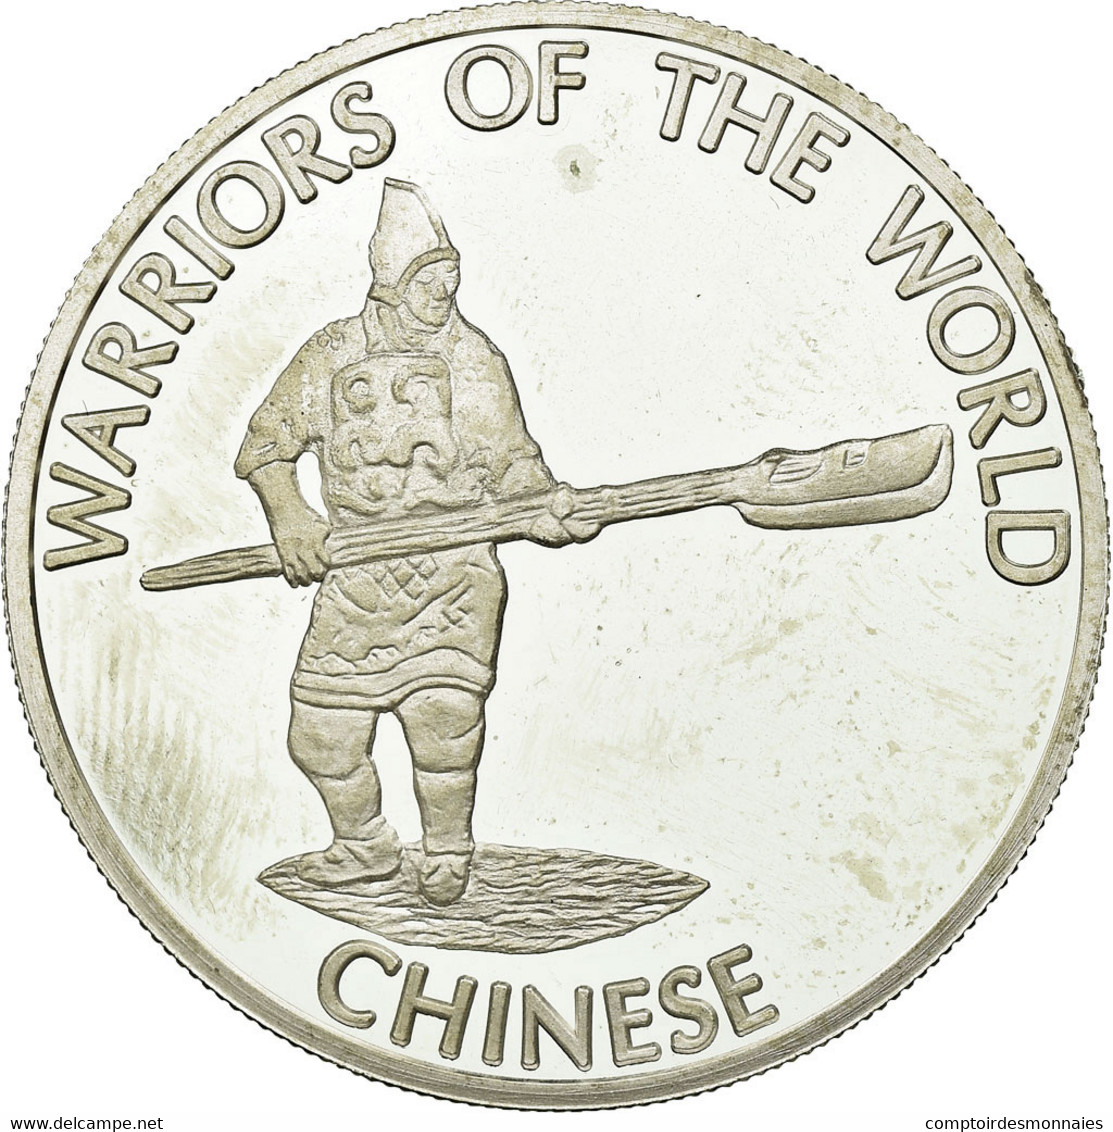 Monnaie, CONGO, DEMOCRATIC REPUBLIC, 10 Francs, 2010, SPL, Silver Plated Copper - Congo (Repubblica Democratica 1998)